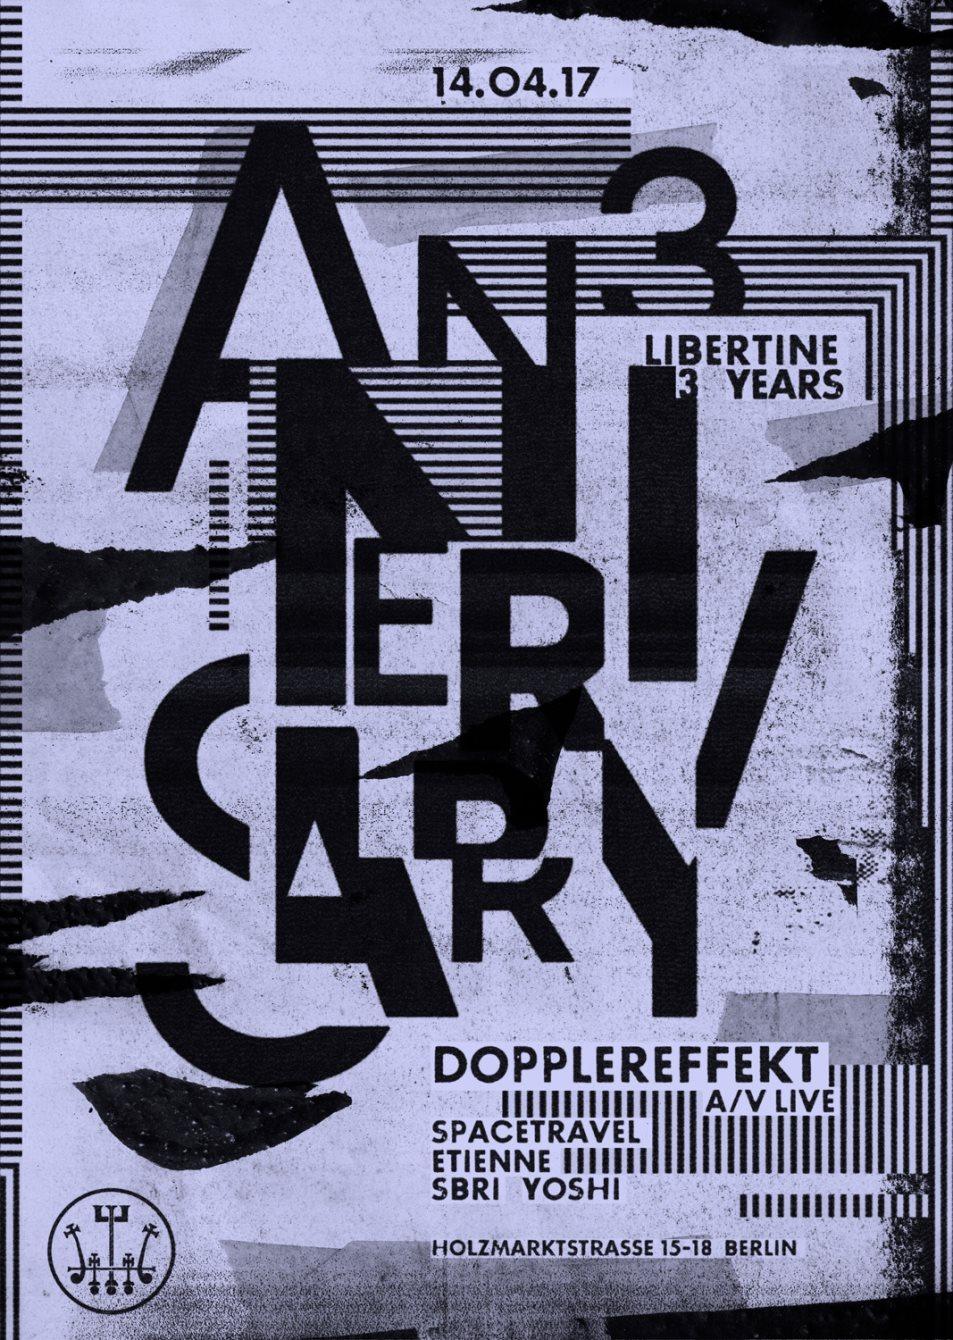 Libertine 3 Years Anniversary with Dopplereffekt ( A/V Live ) - Flyer front